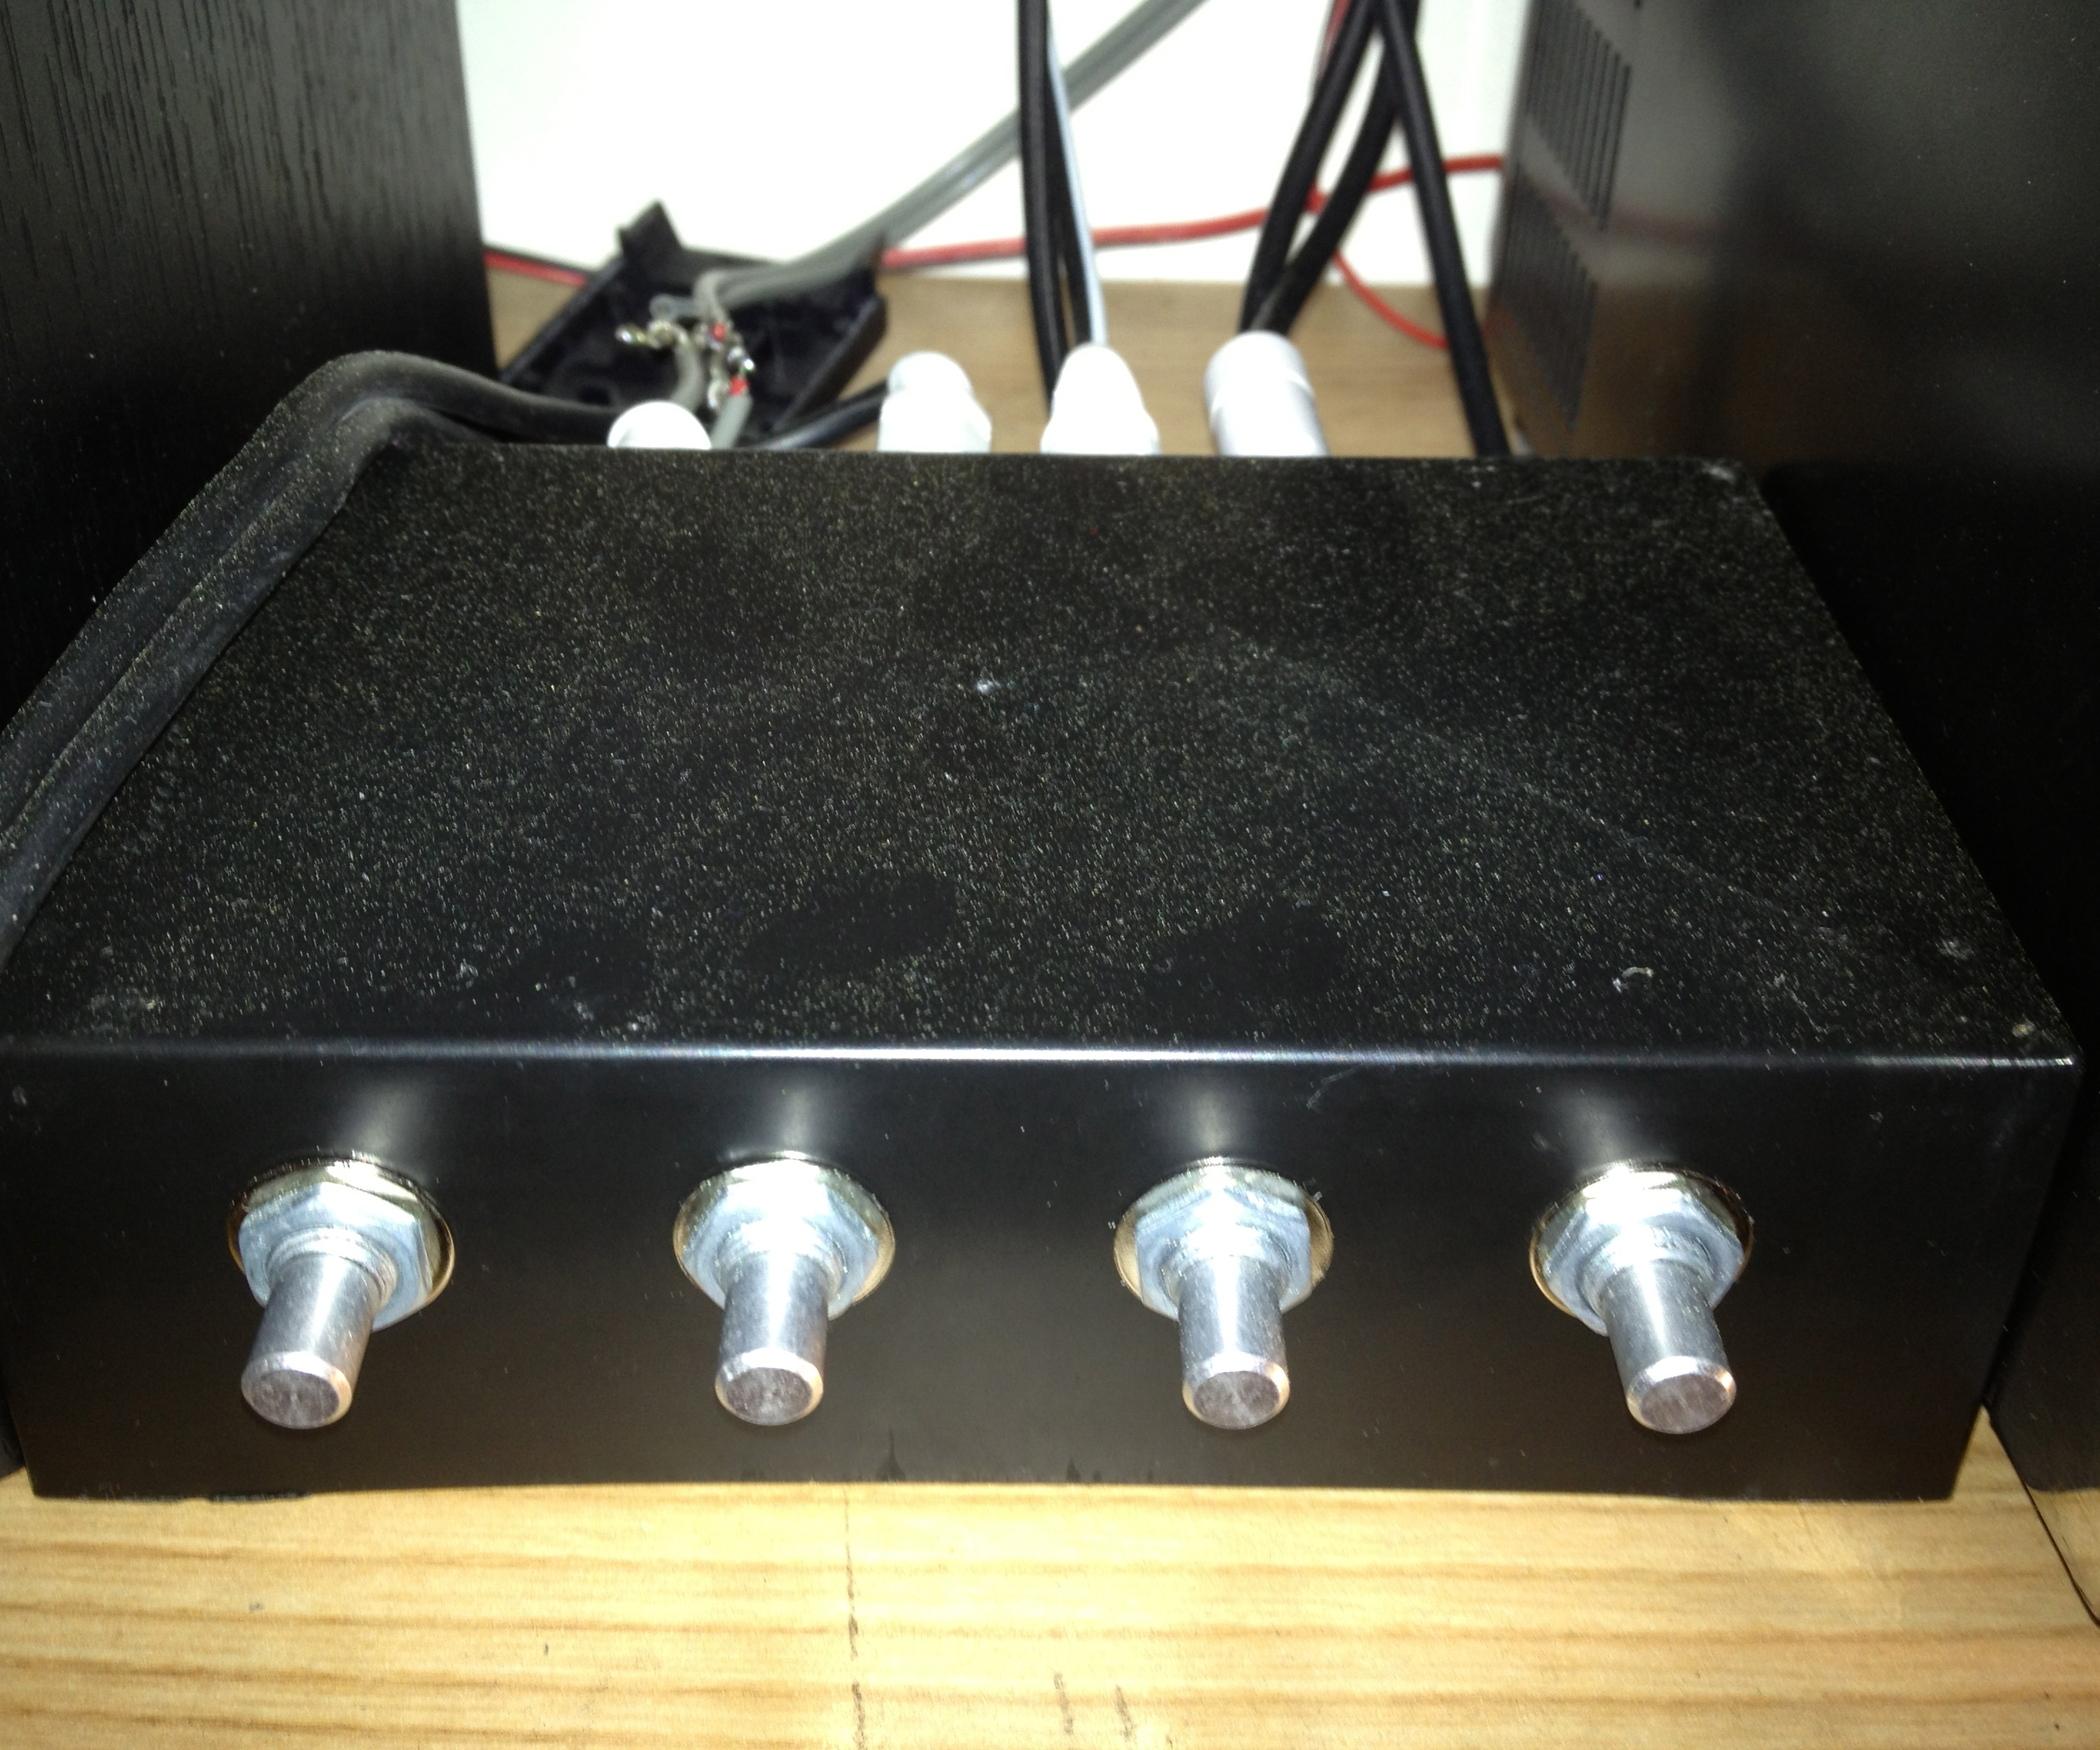 Remarkable Passive Audio Mixer Circuit X3Cbx3Eaudio Mixer Circuitx3C Bx3E Wiring Cloud Hisonepsysticxongrecoveryedborg